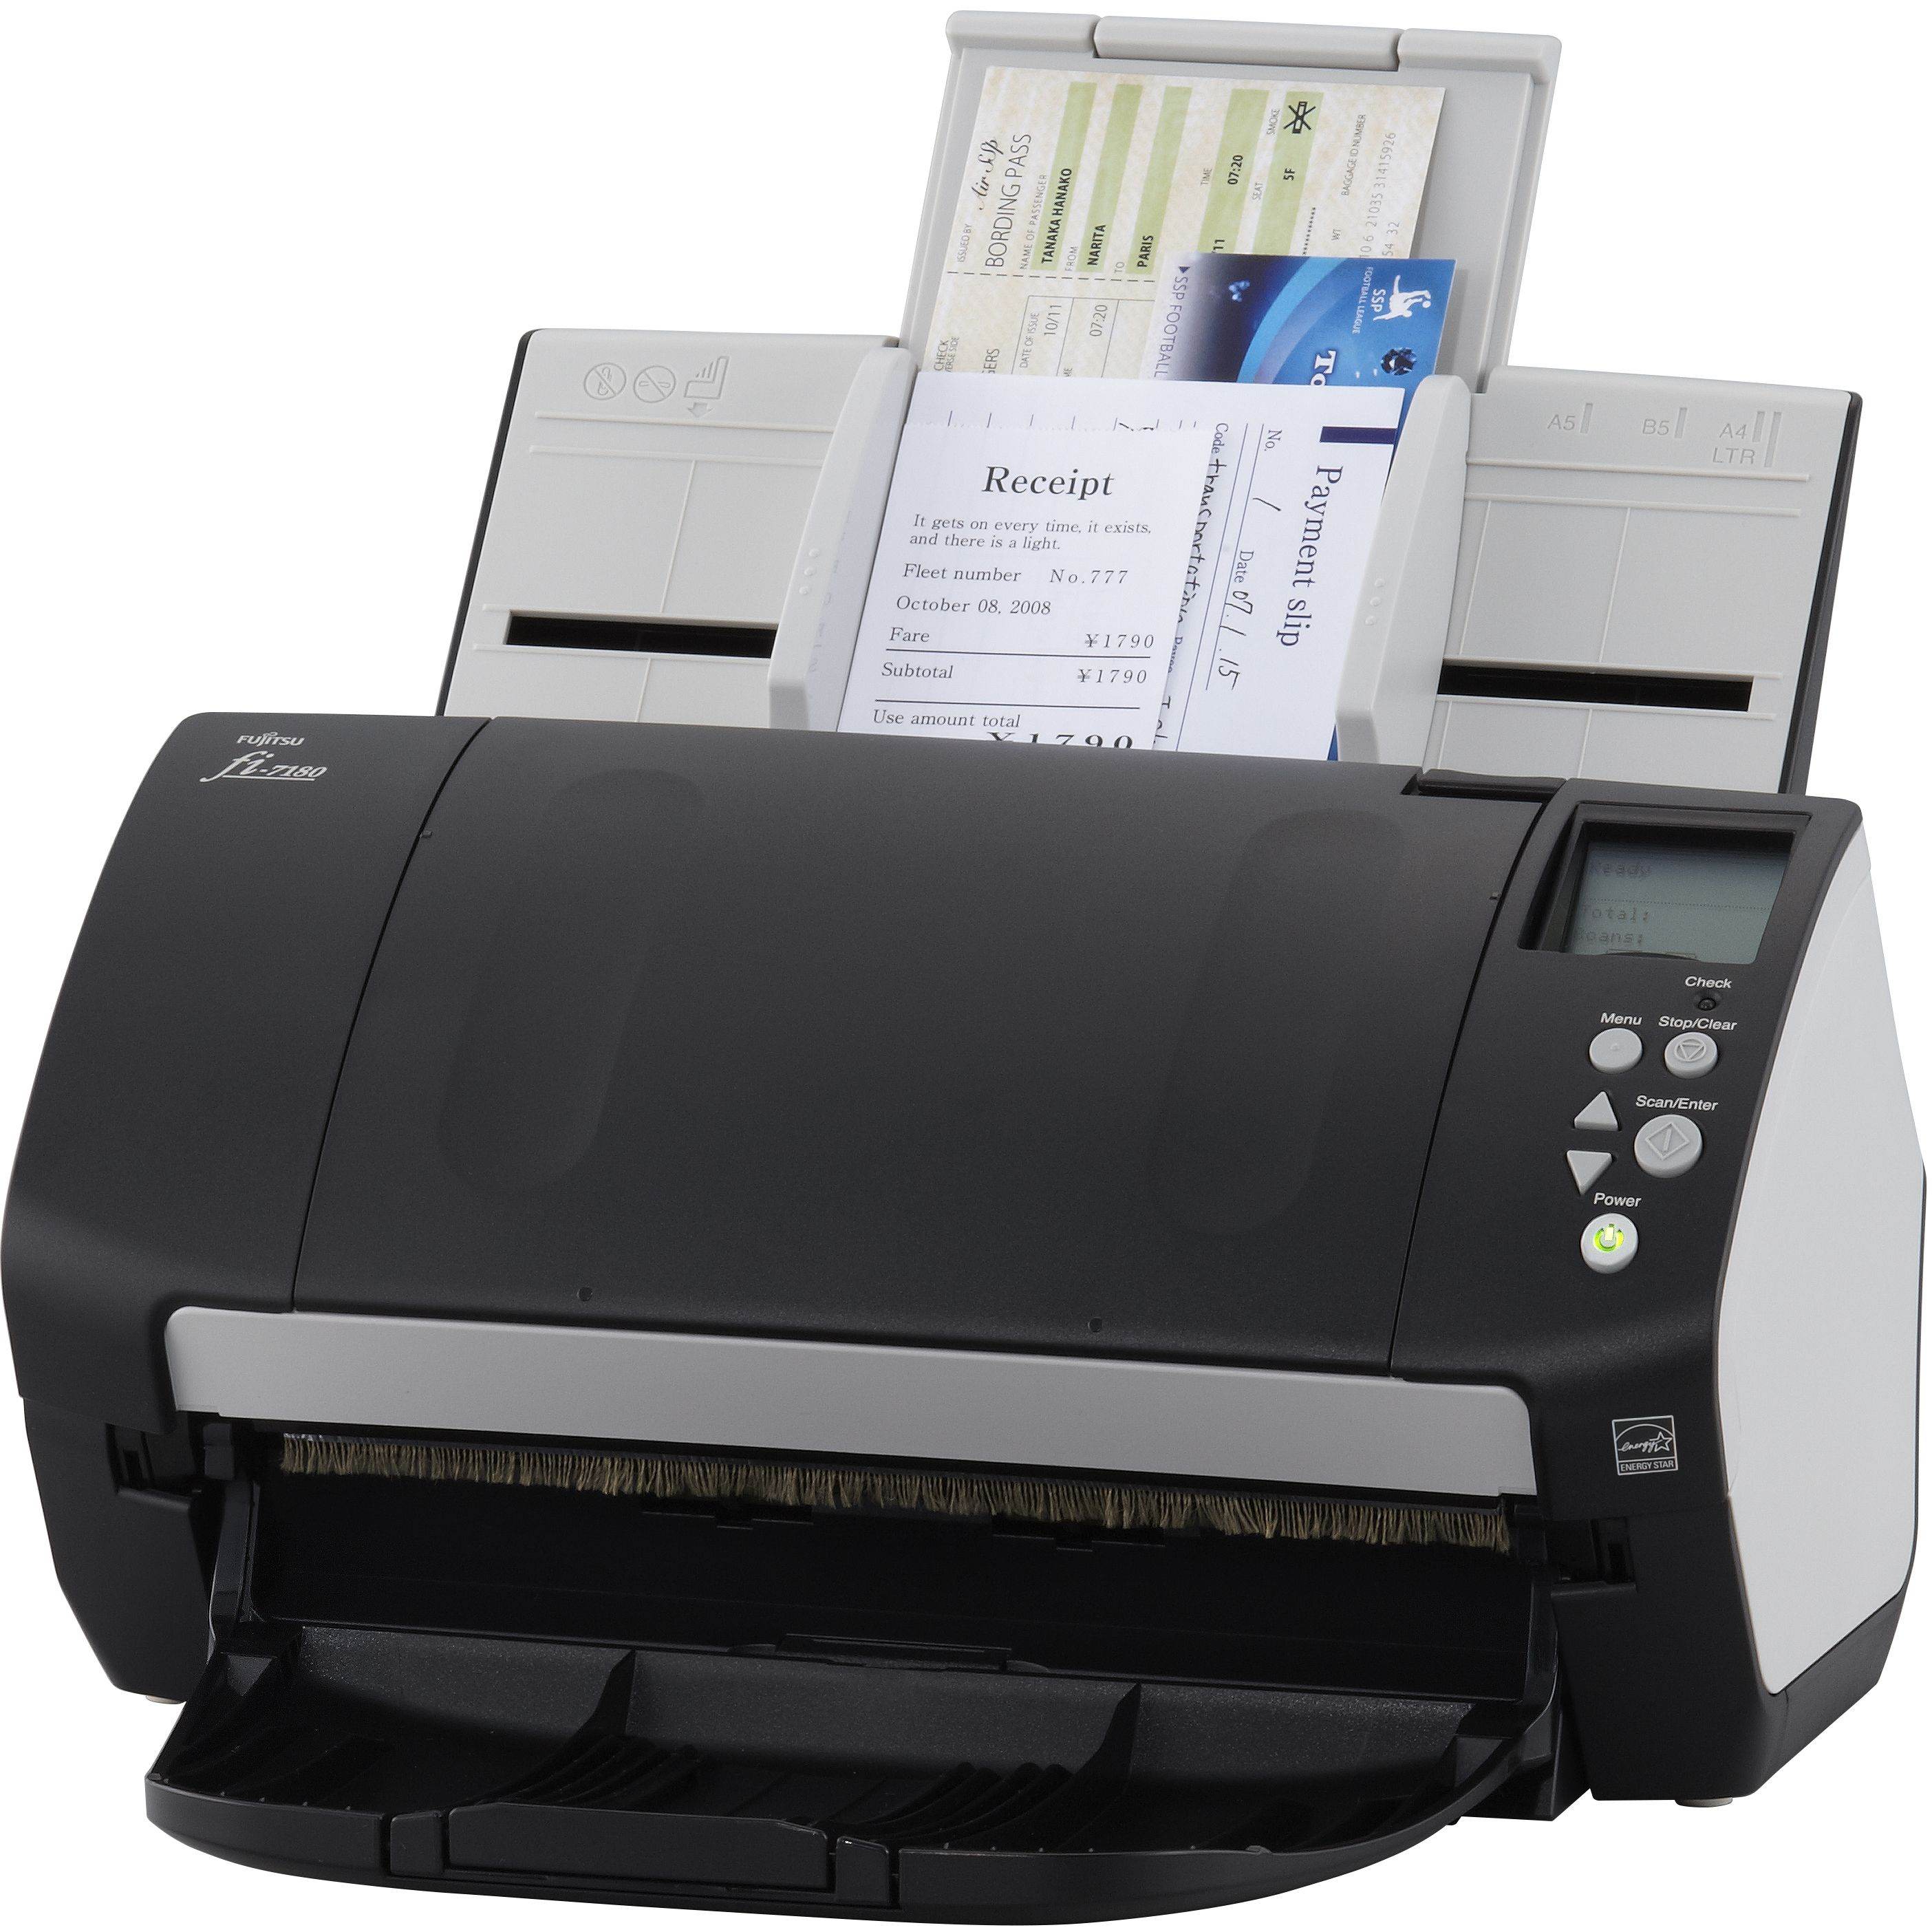 Fujitsu Fi 7180 Sheetfed Scanner Walmartcom